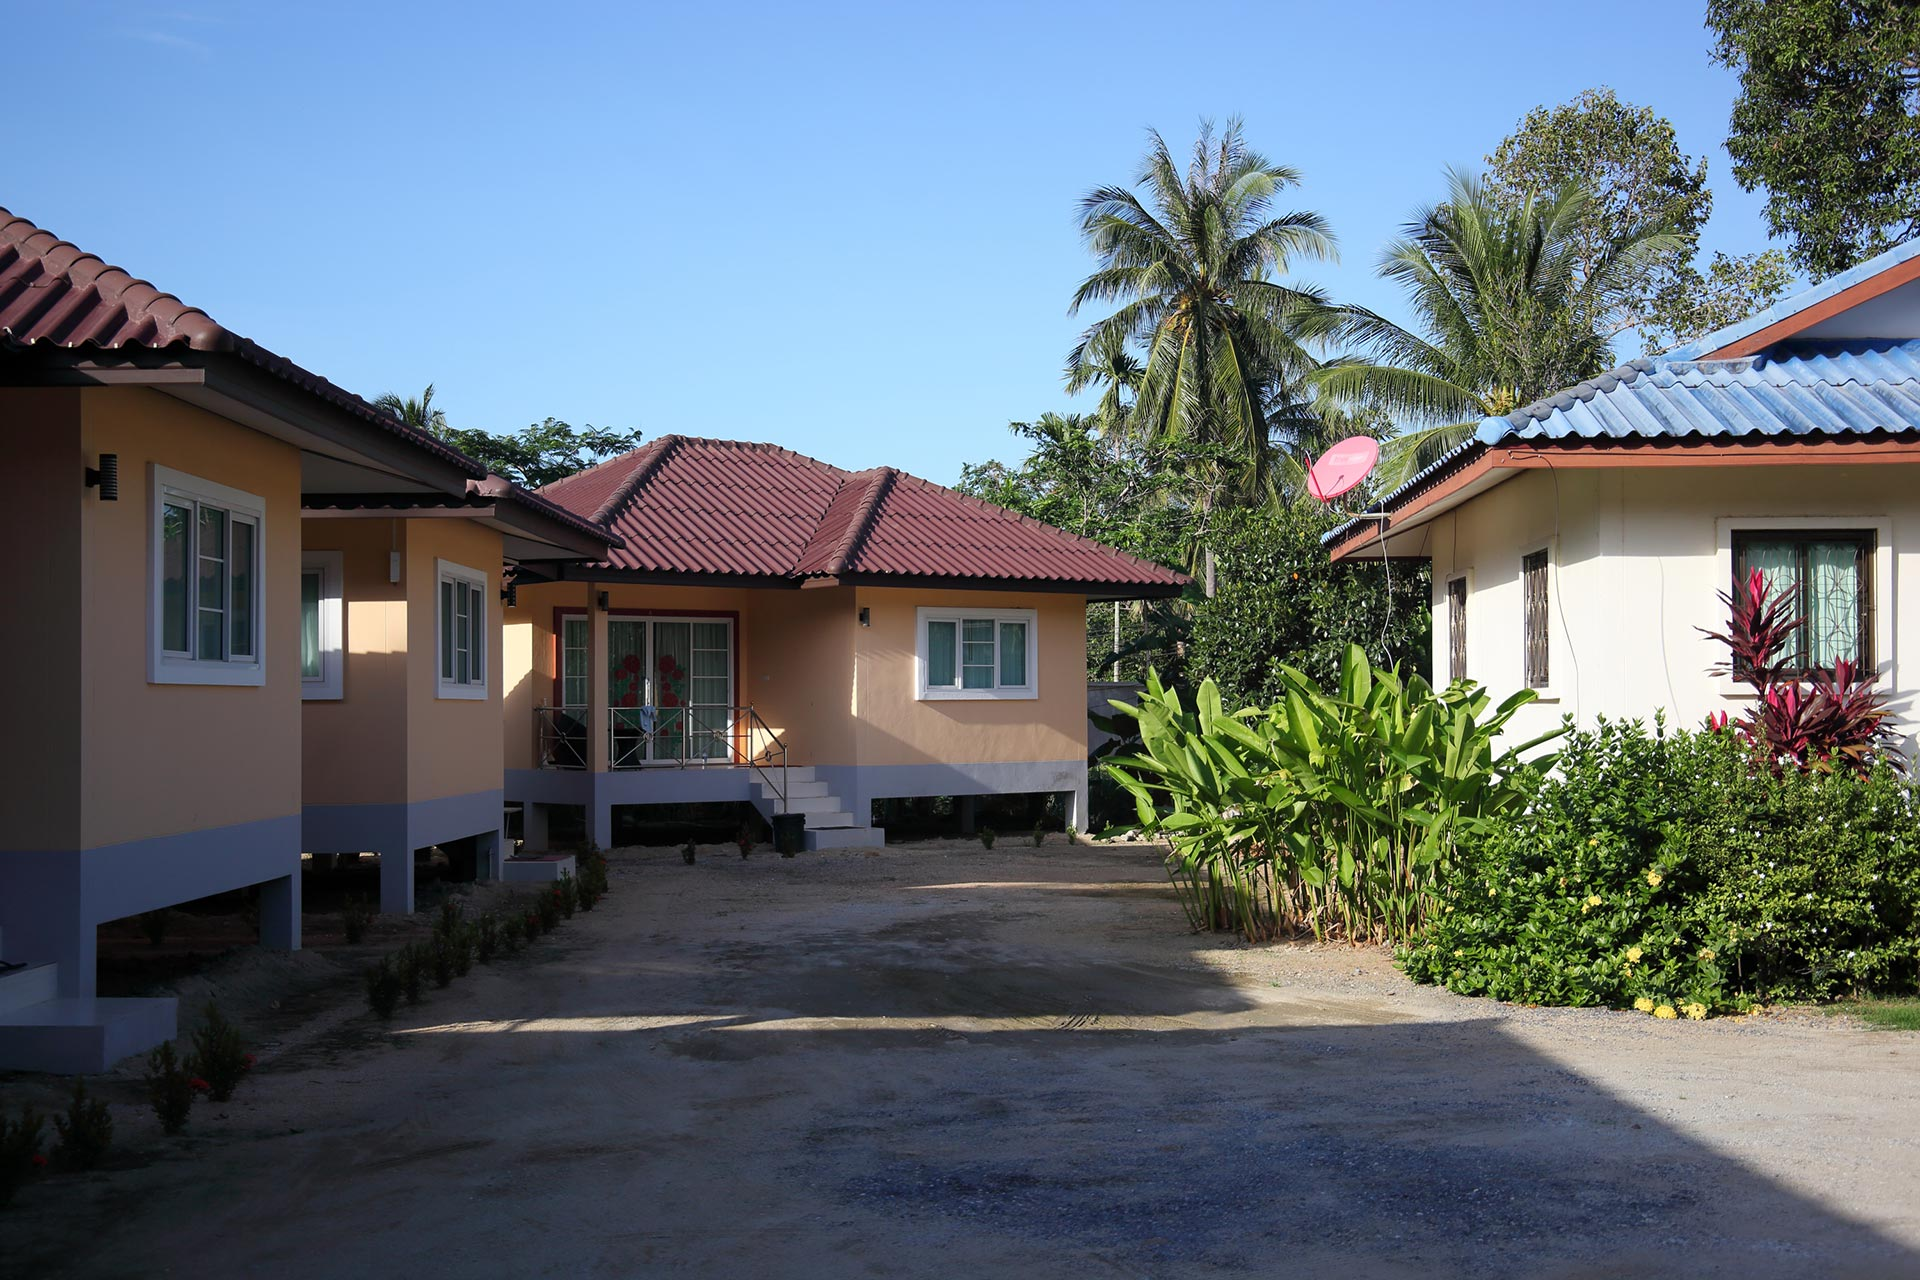 dom house samui